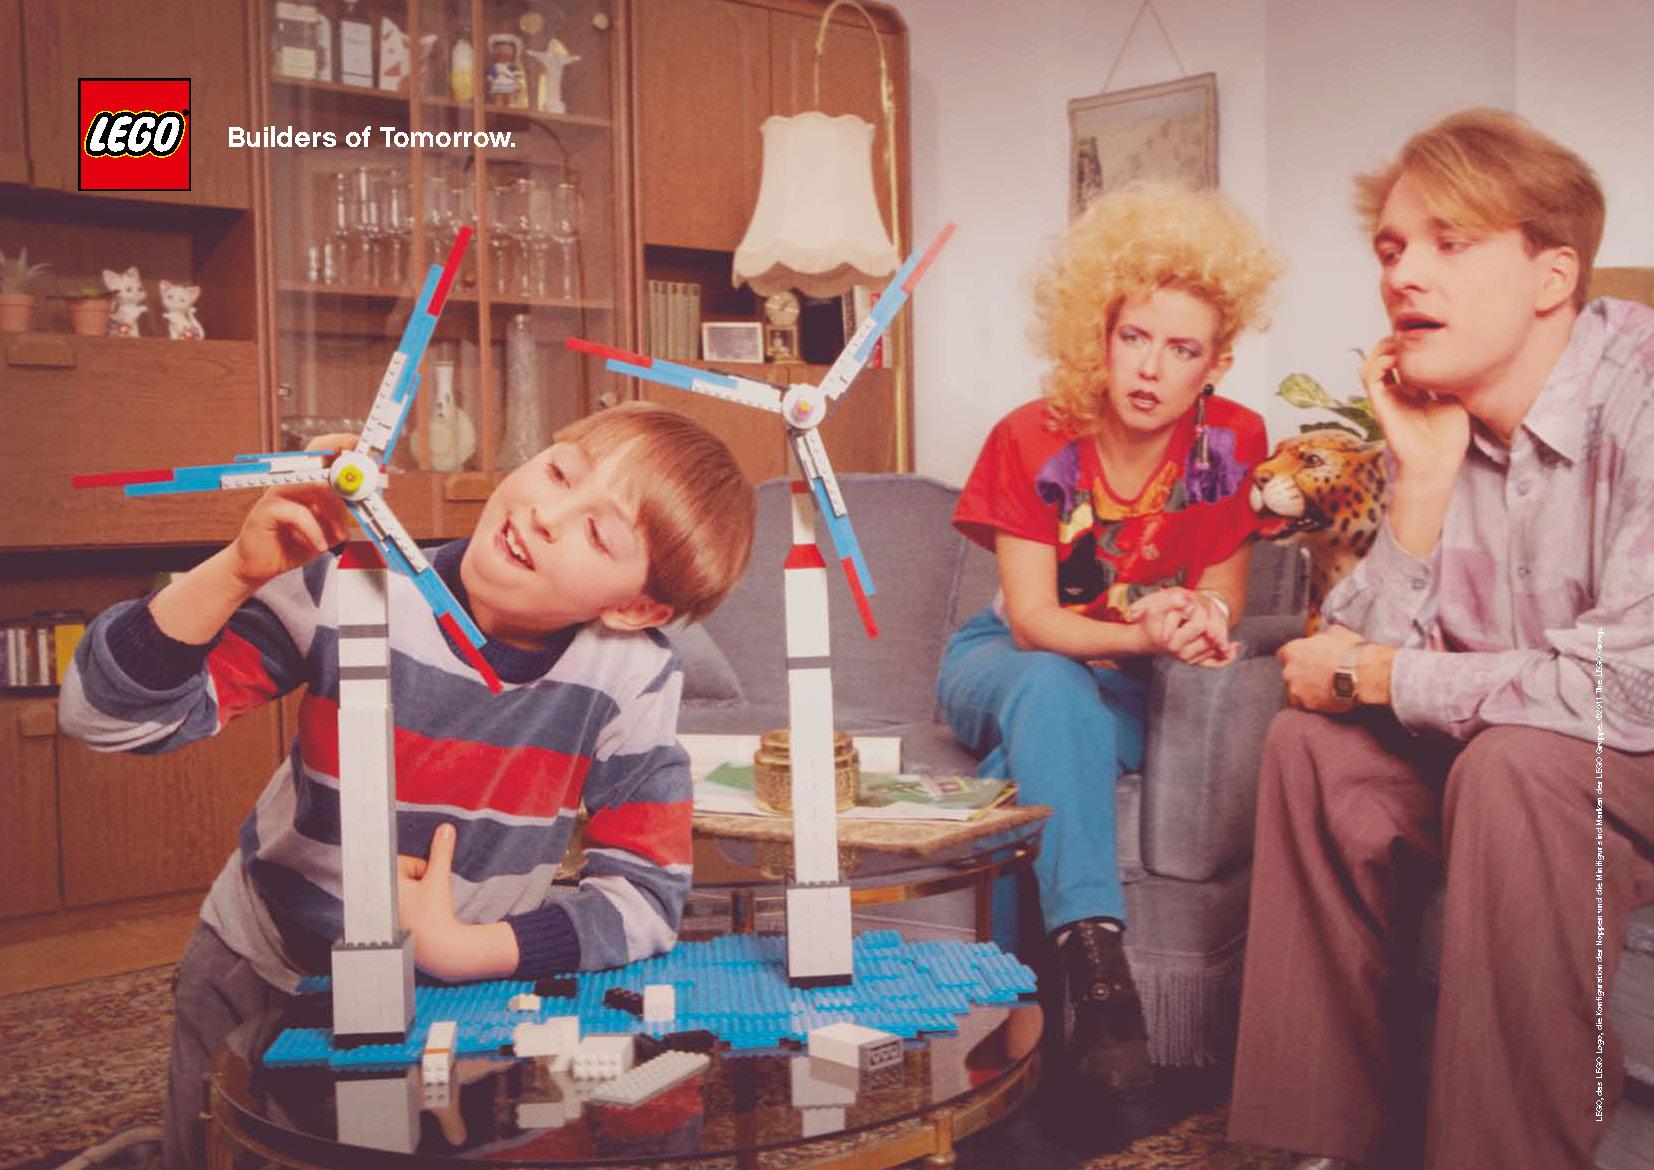 lego eighies anni 80 pubblicità storia